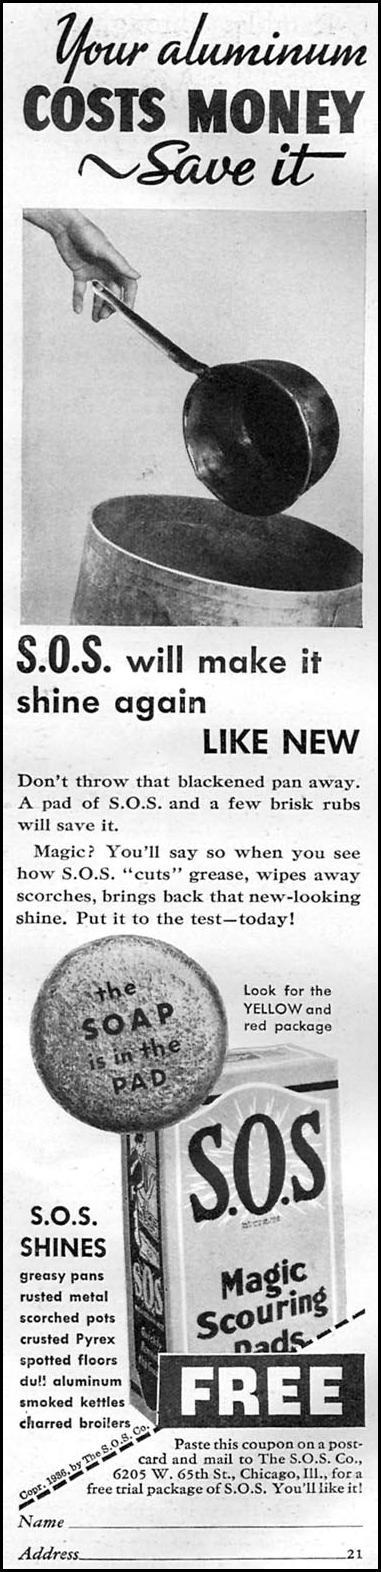 S.O.S MAGIC SCOURING PADS GOOD HOUSEKEEPING 04/01/1936 p. 225